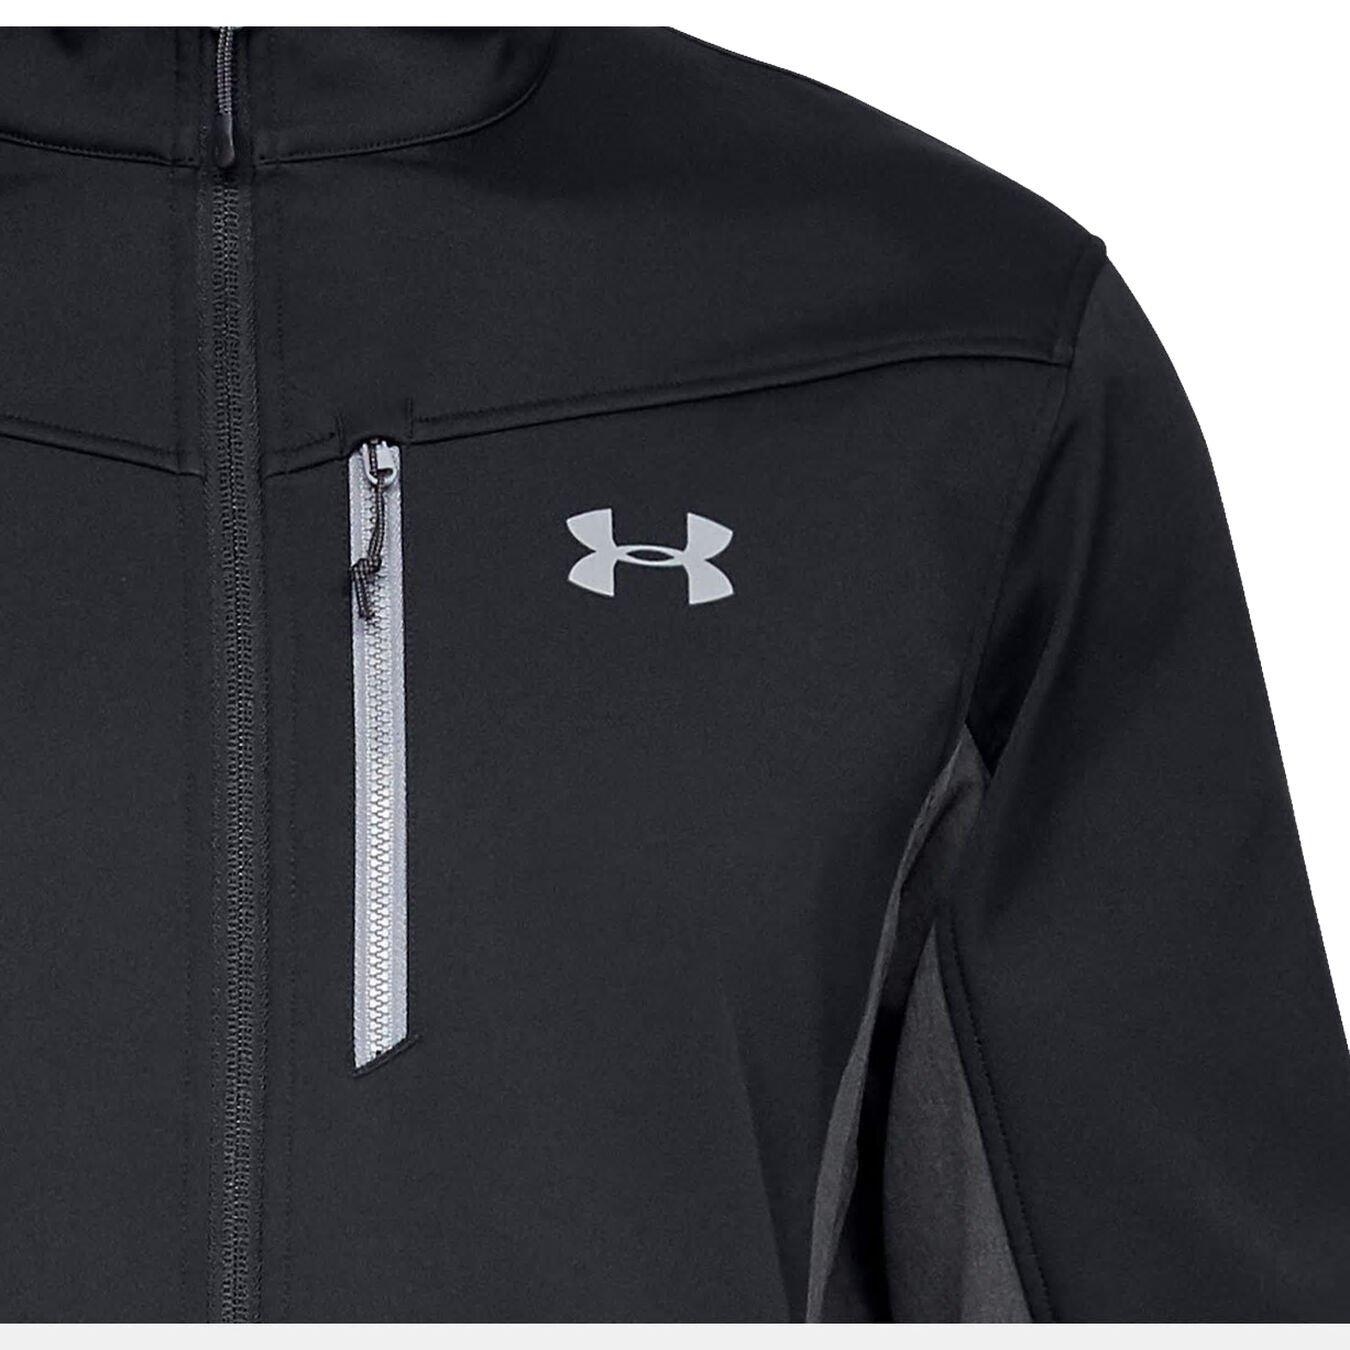 Under Armour mens Coldgear Infrared Shield Jacket